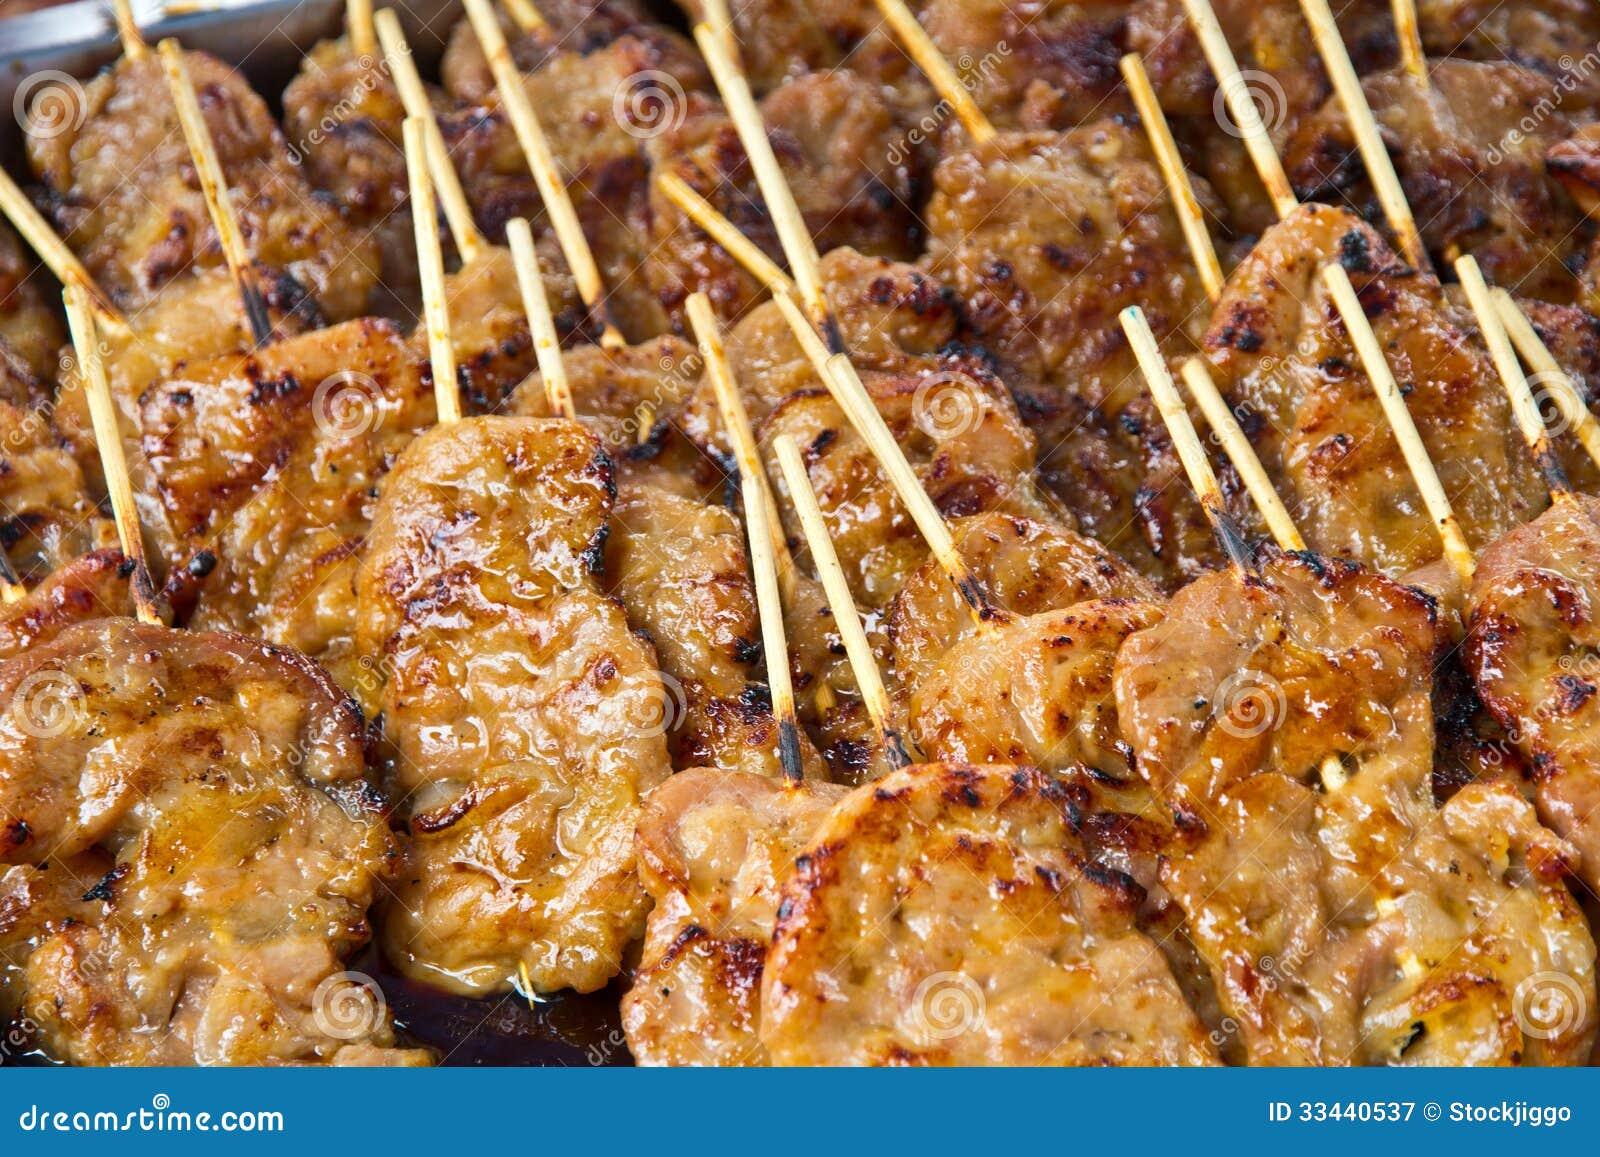 Bar b q pork thailand style fast food stock image image for Food for bar b q